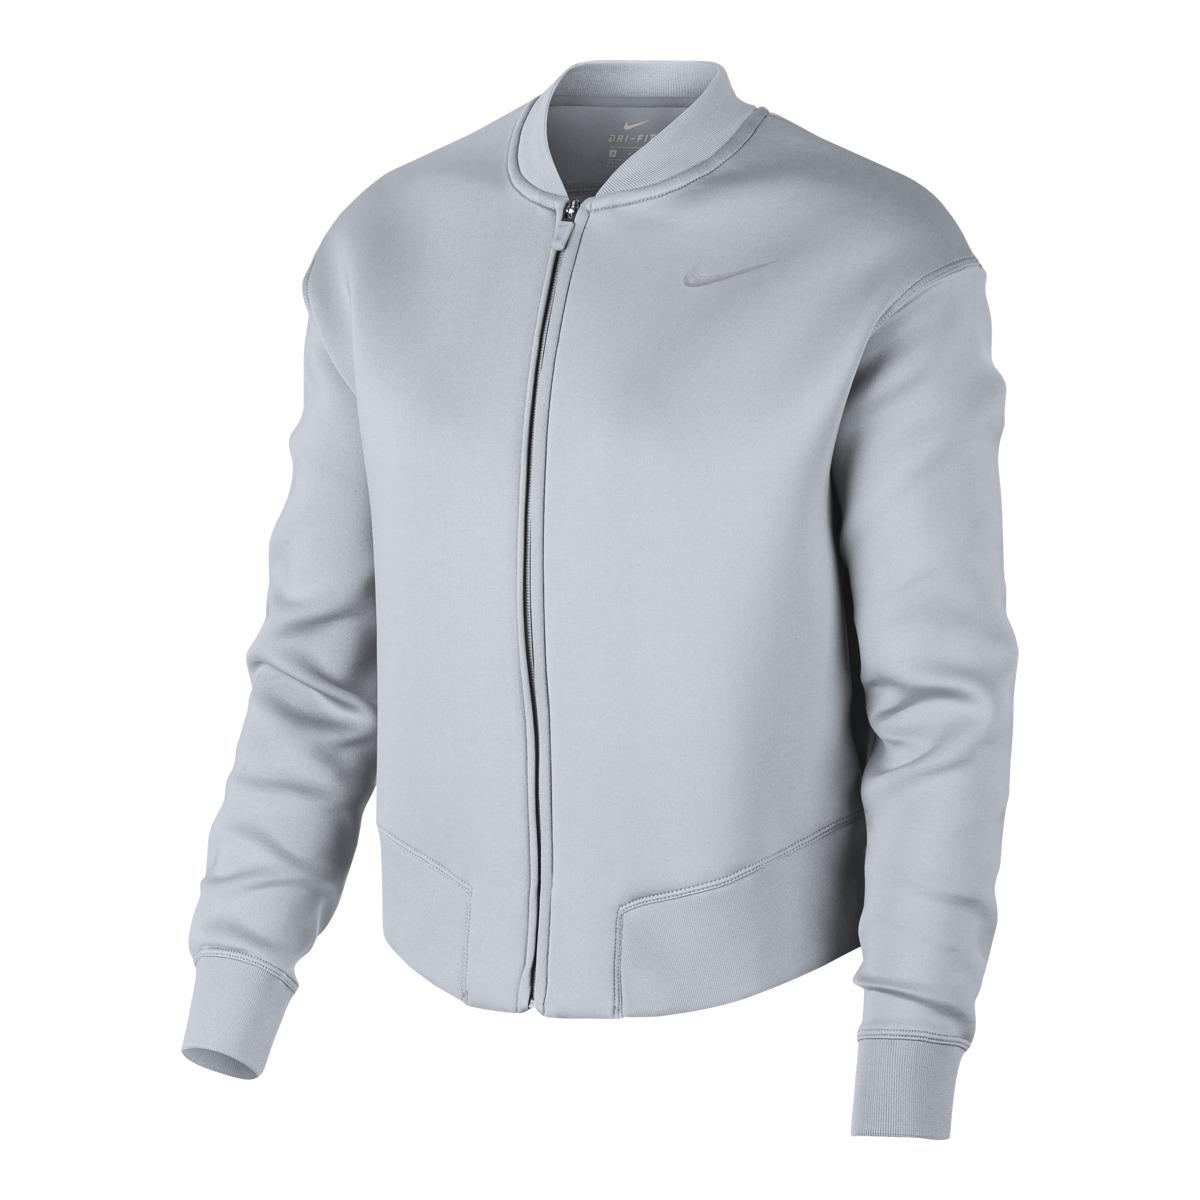 0c6c01de2f82 Lyst - Nike Therma Sphere Jacket in Gray